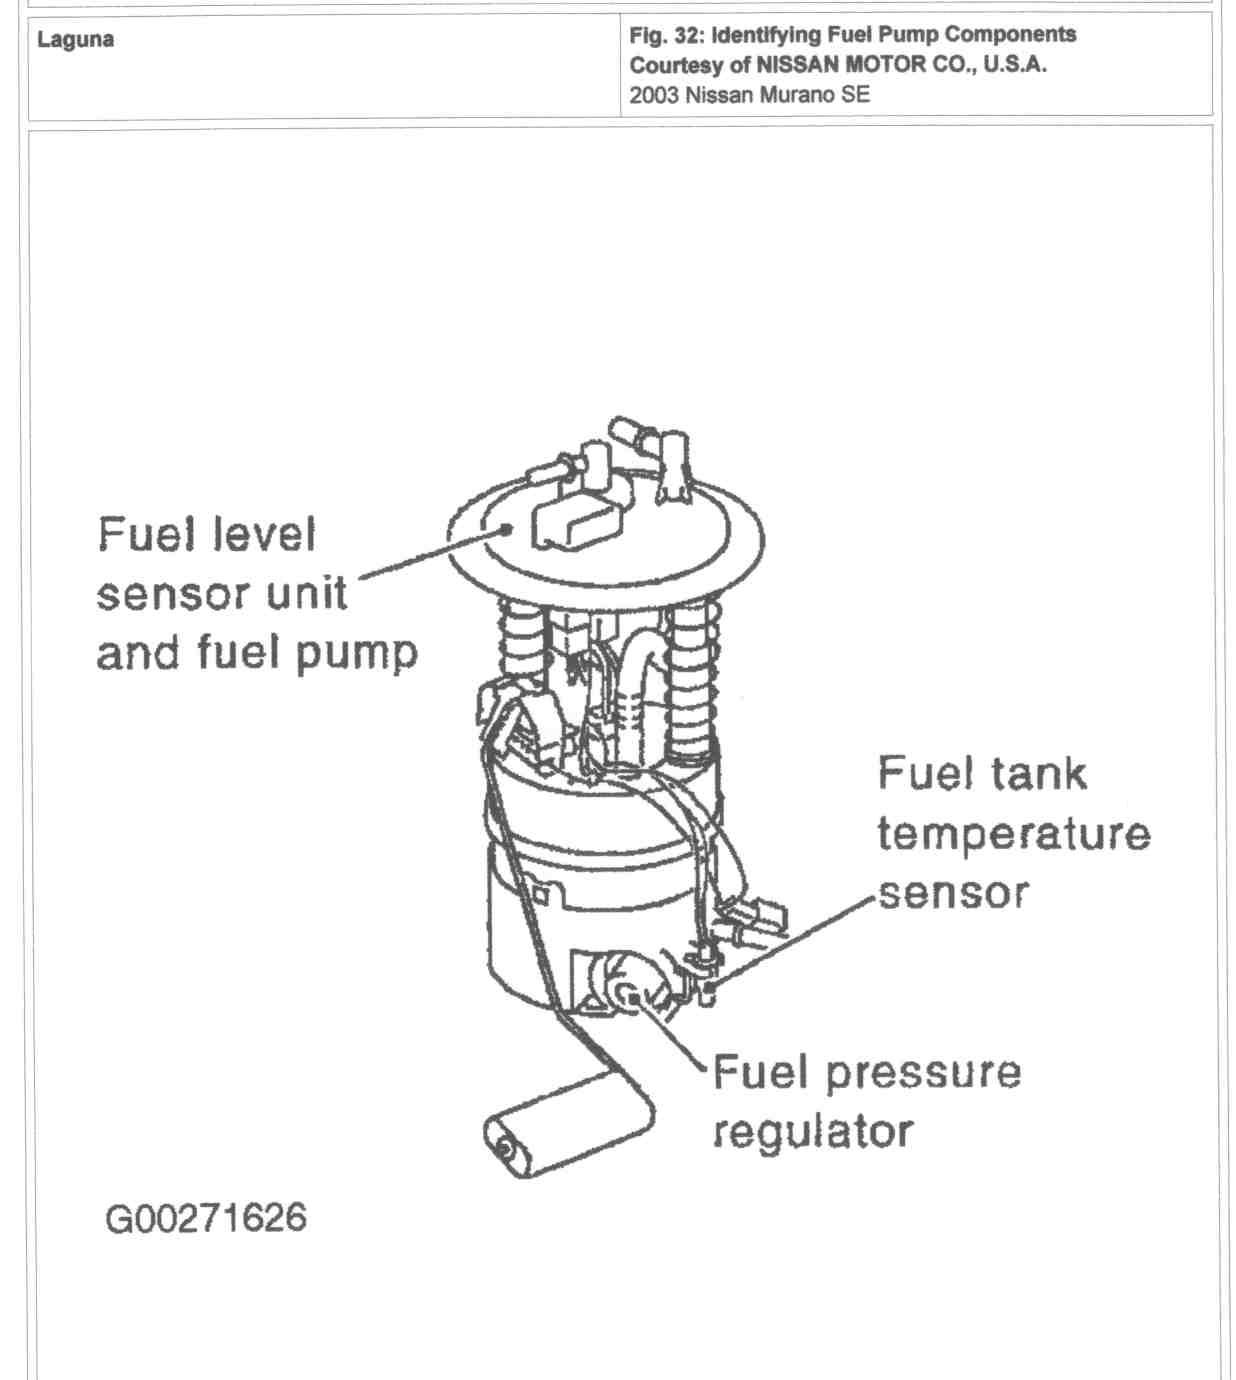 2003 Nissan Murano Fuel Pump Diagram Auto Electrical Wiring Diagram